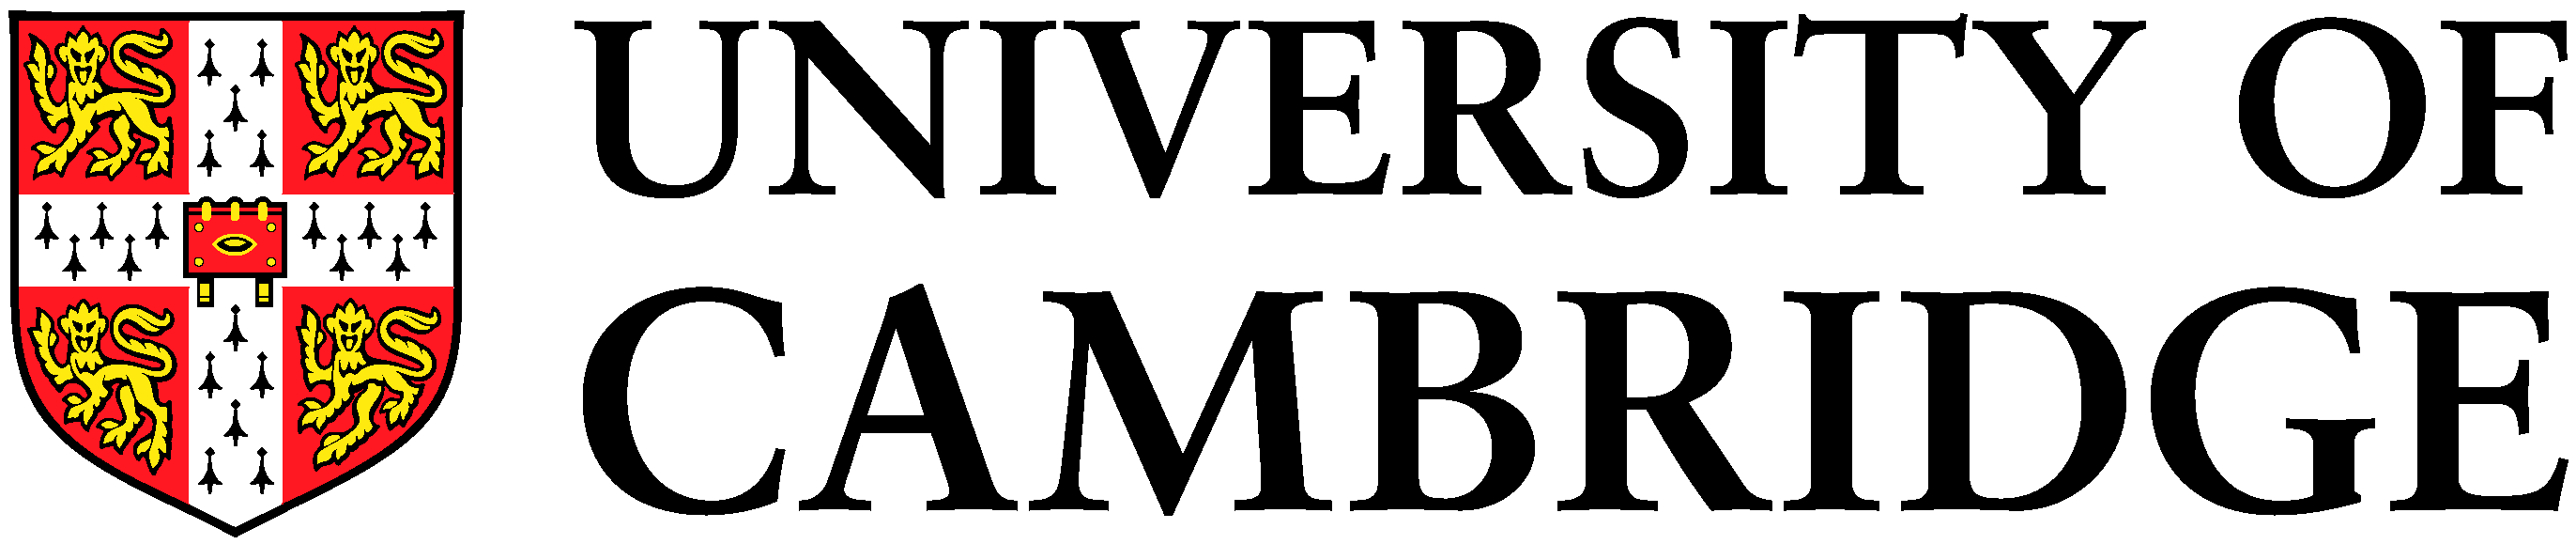 University of Cambridge Logo.